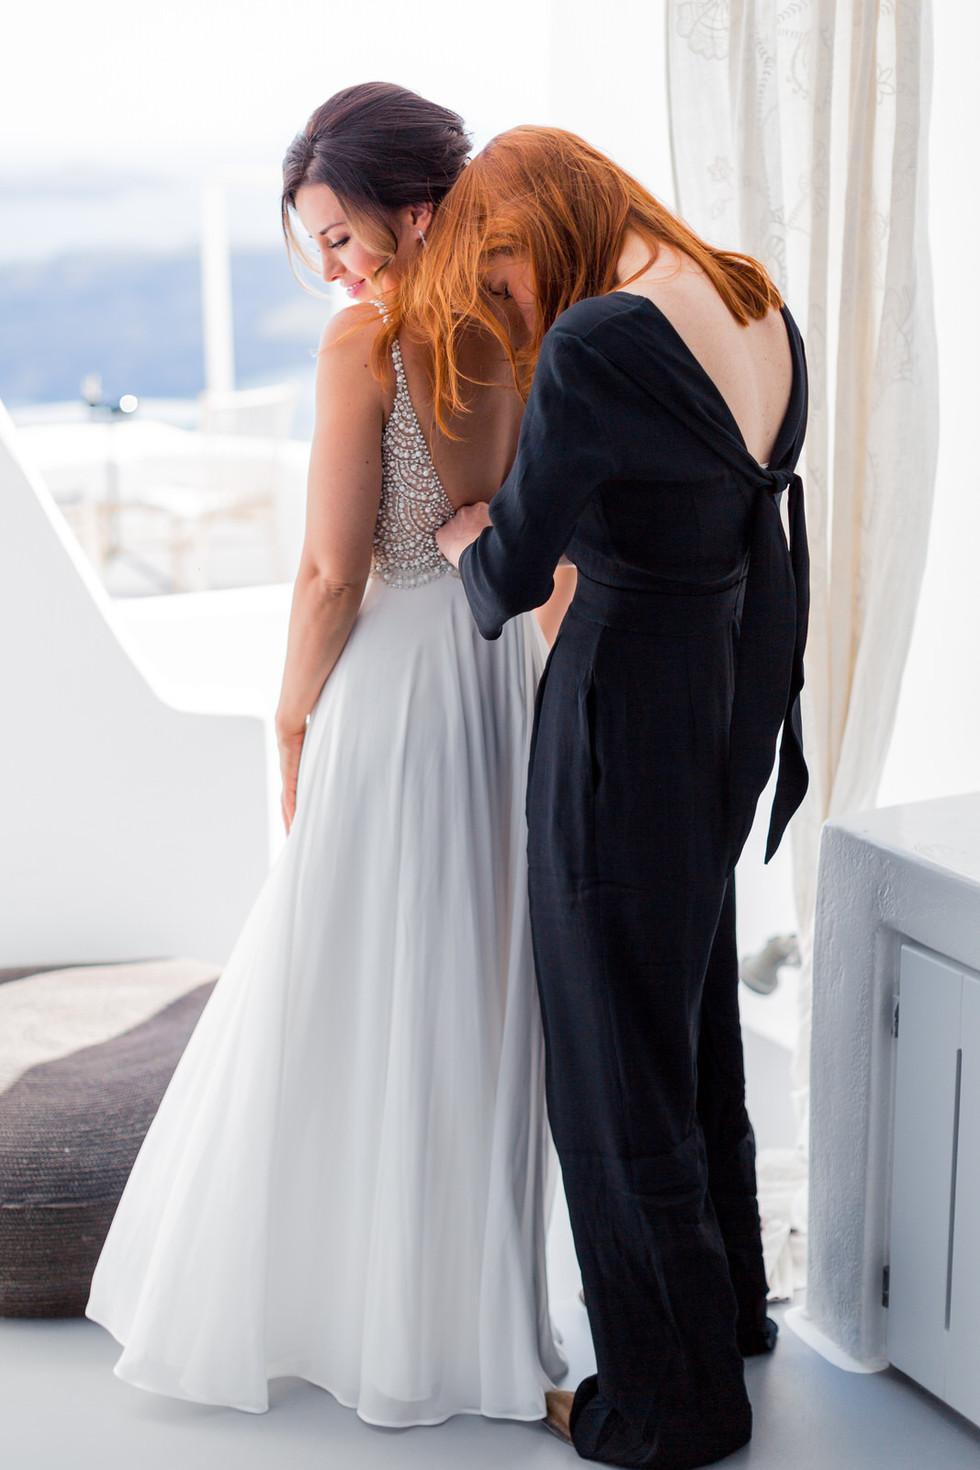 Santorini-Elopement- wedding-114.jpg